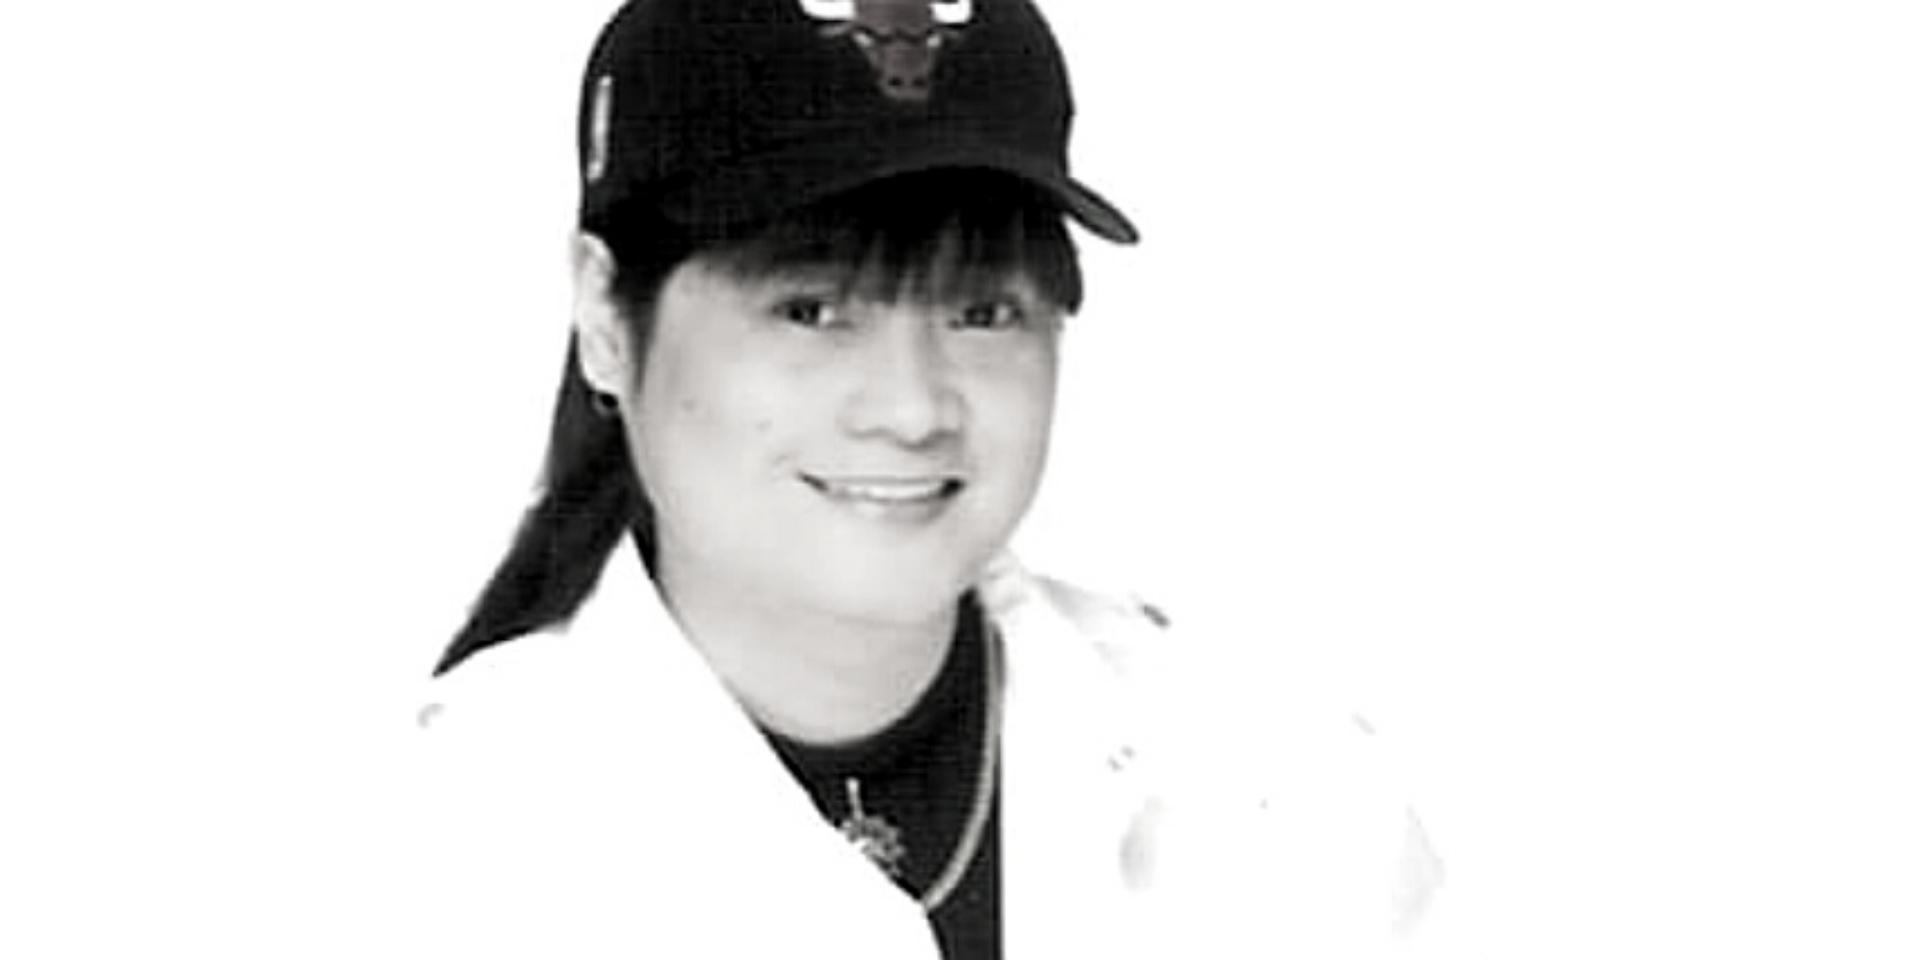 Filipino pop icon April Boy Regino passes away at 51